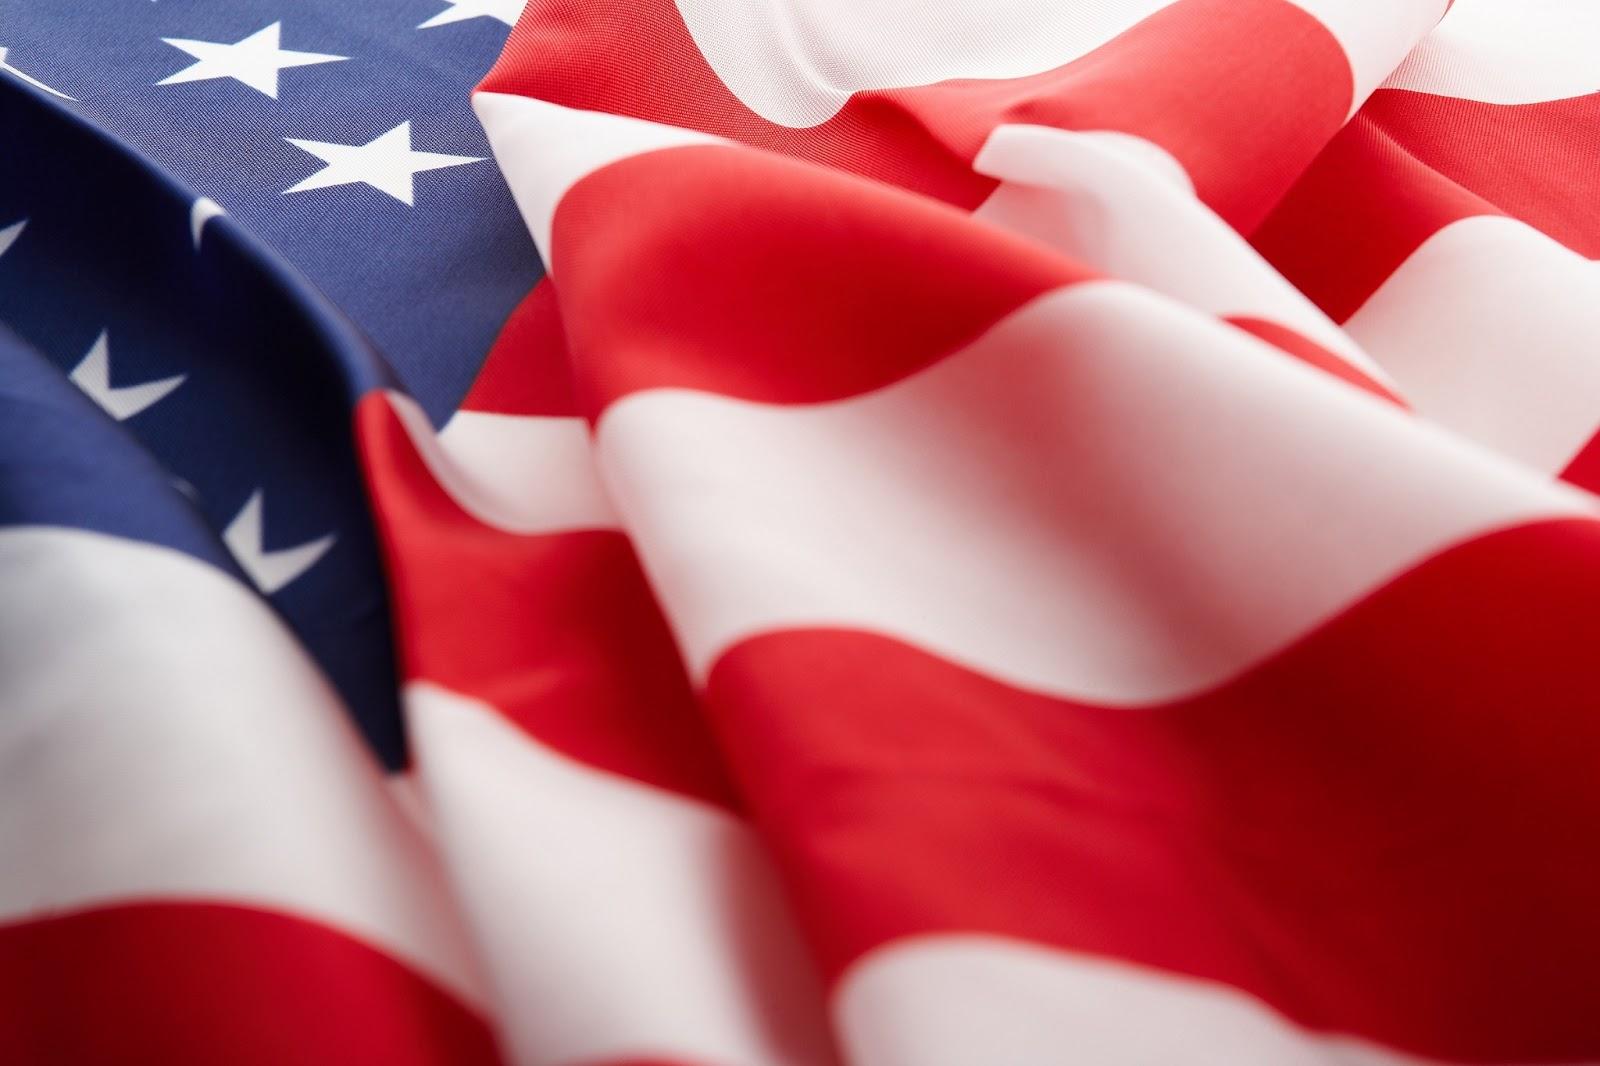 american flag | My photo